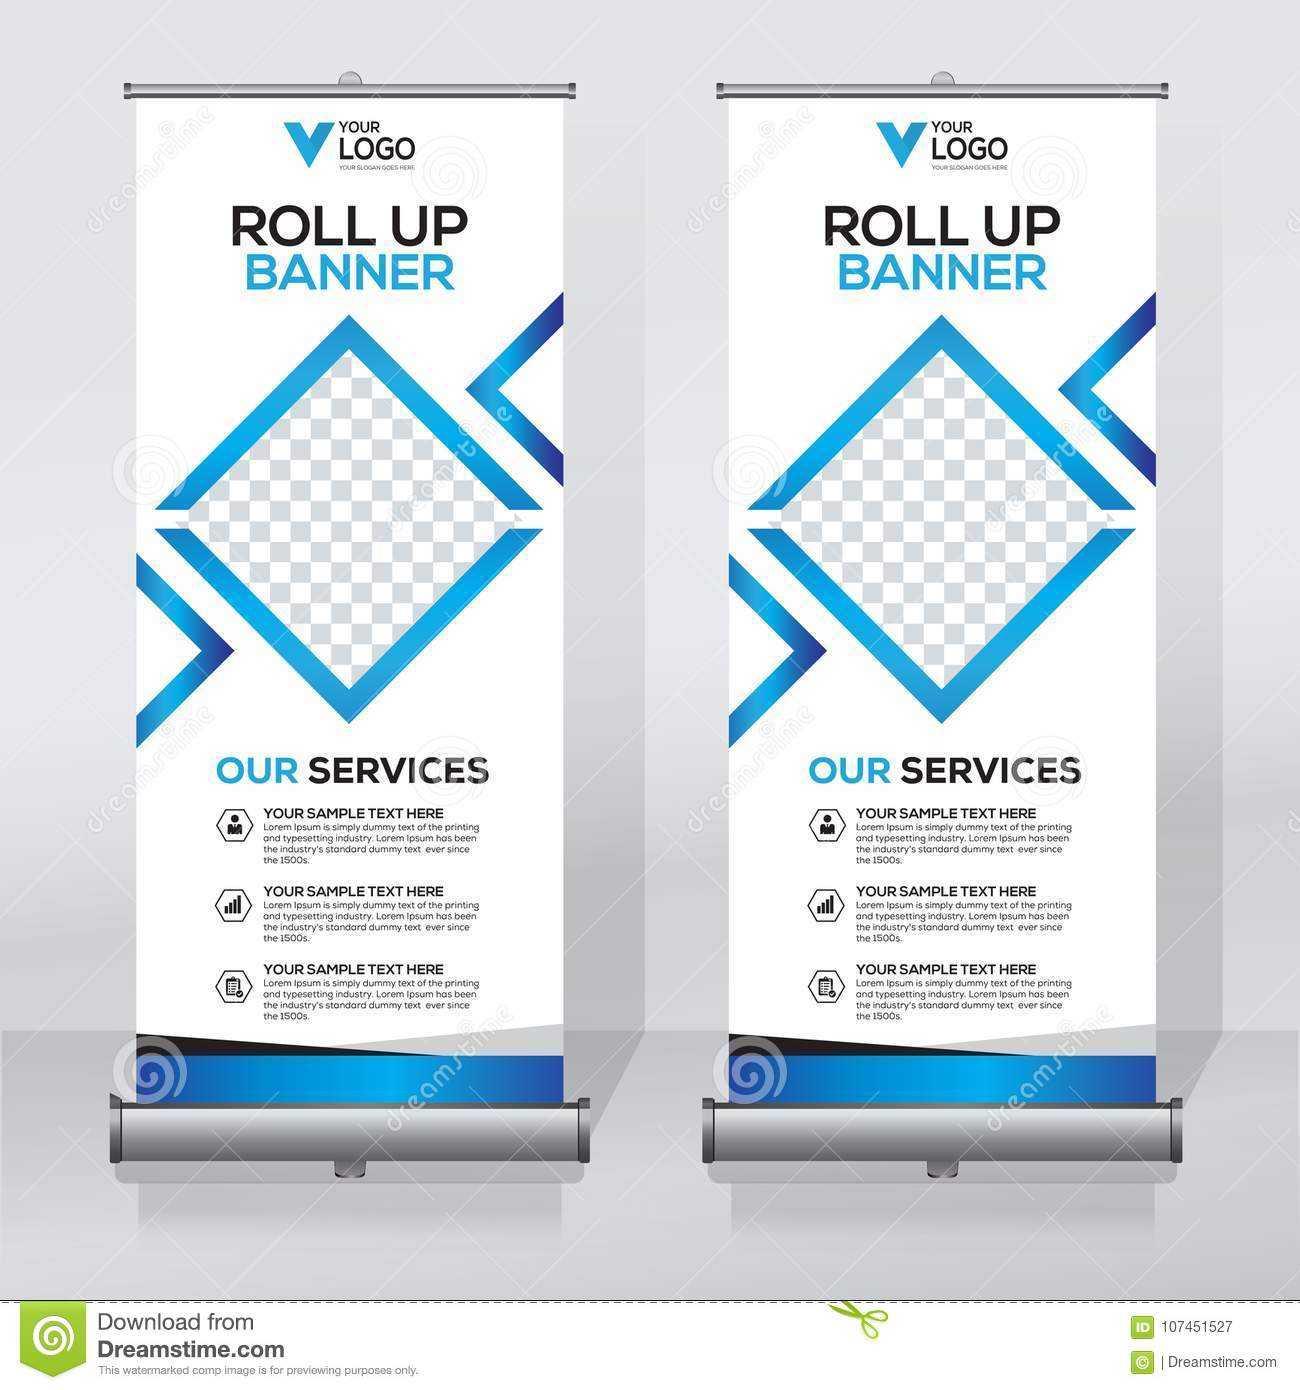 Roll Up Banner Design Template, Vertical, Abstract In Pop Up Banner Design Template